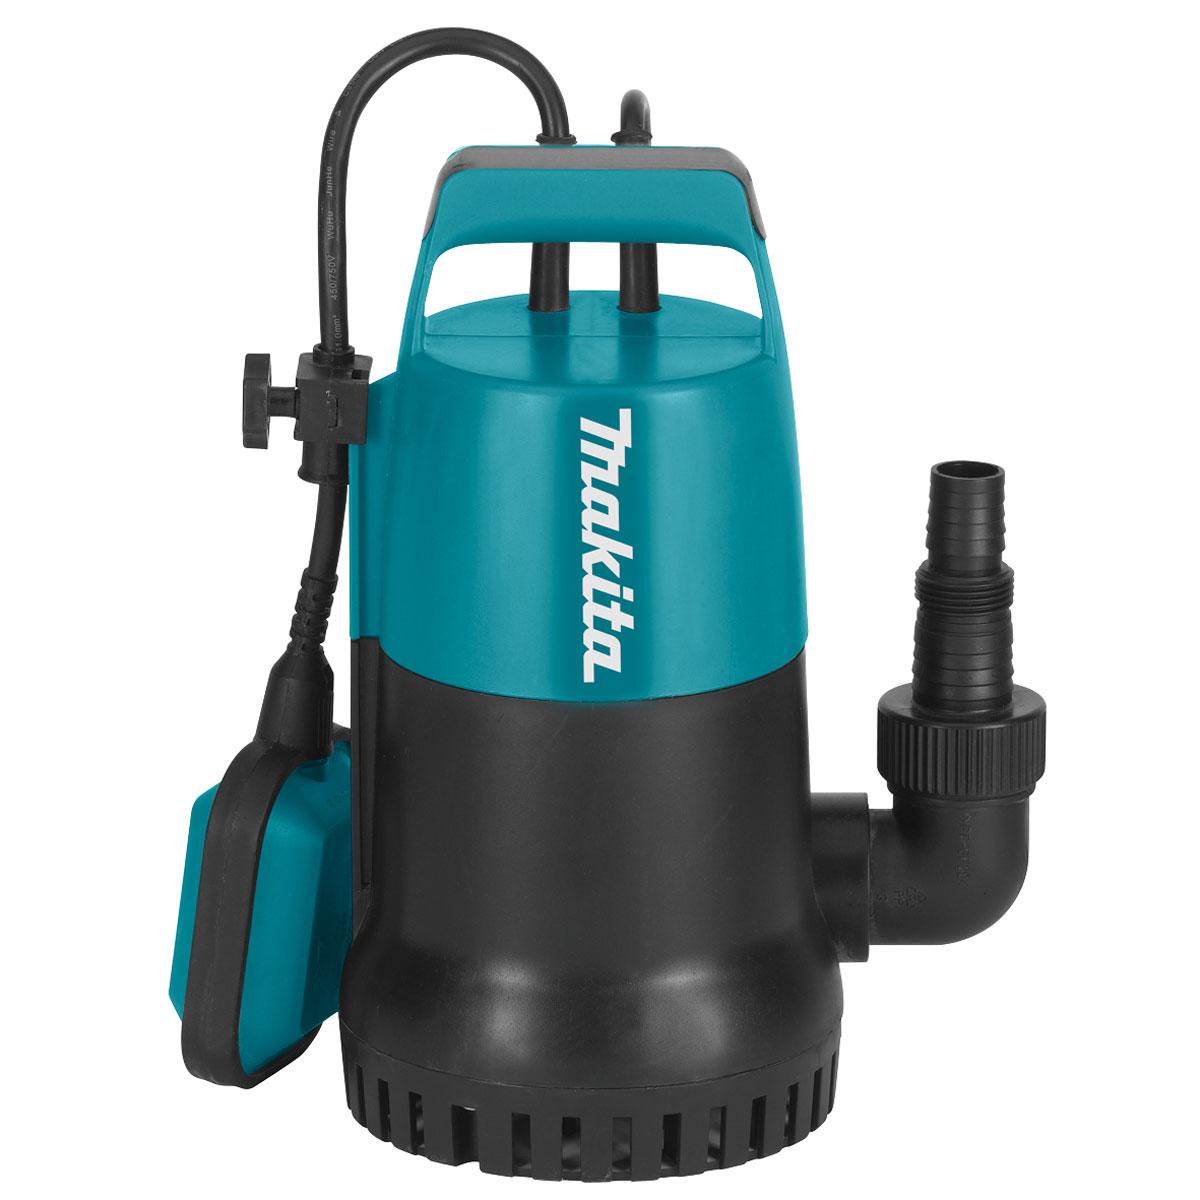 Makita PF0300 potopna pumpa za čistu vodu